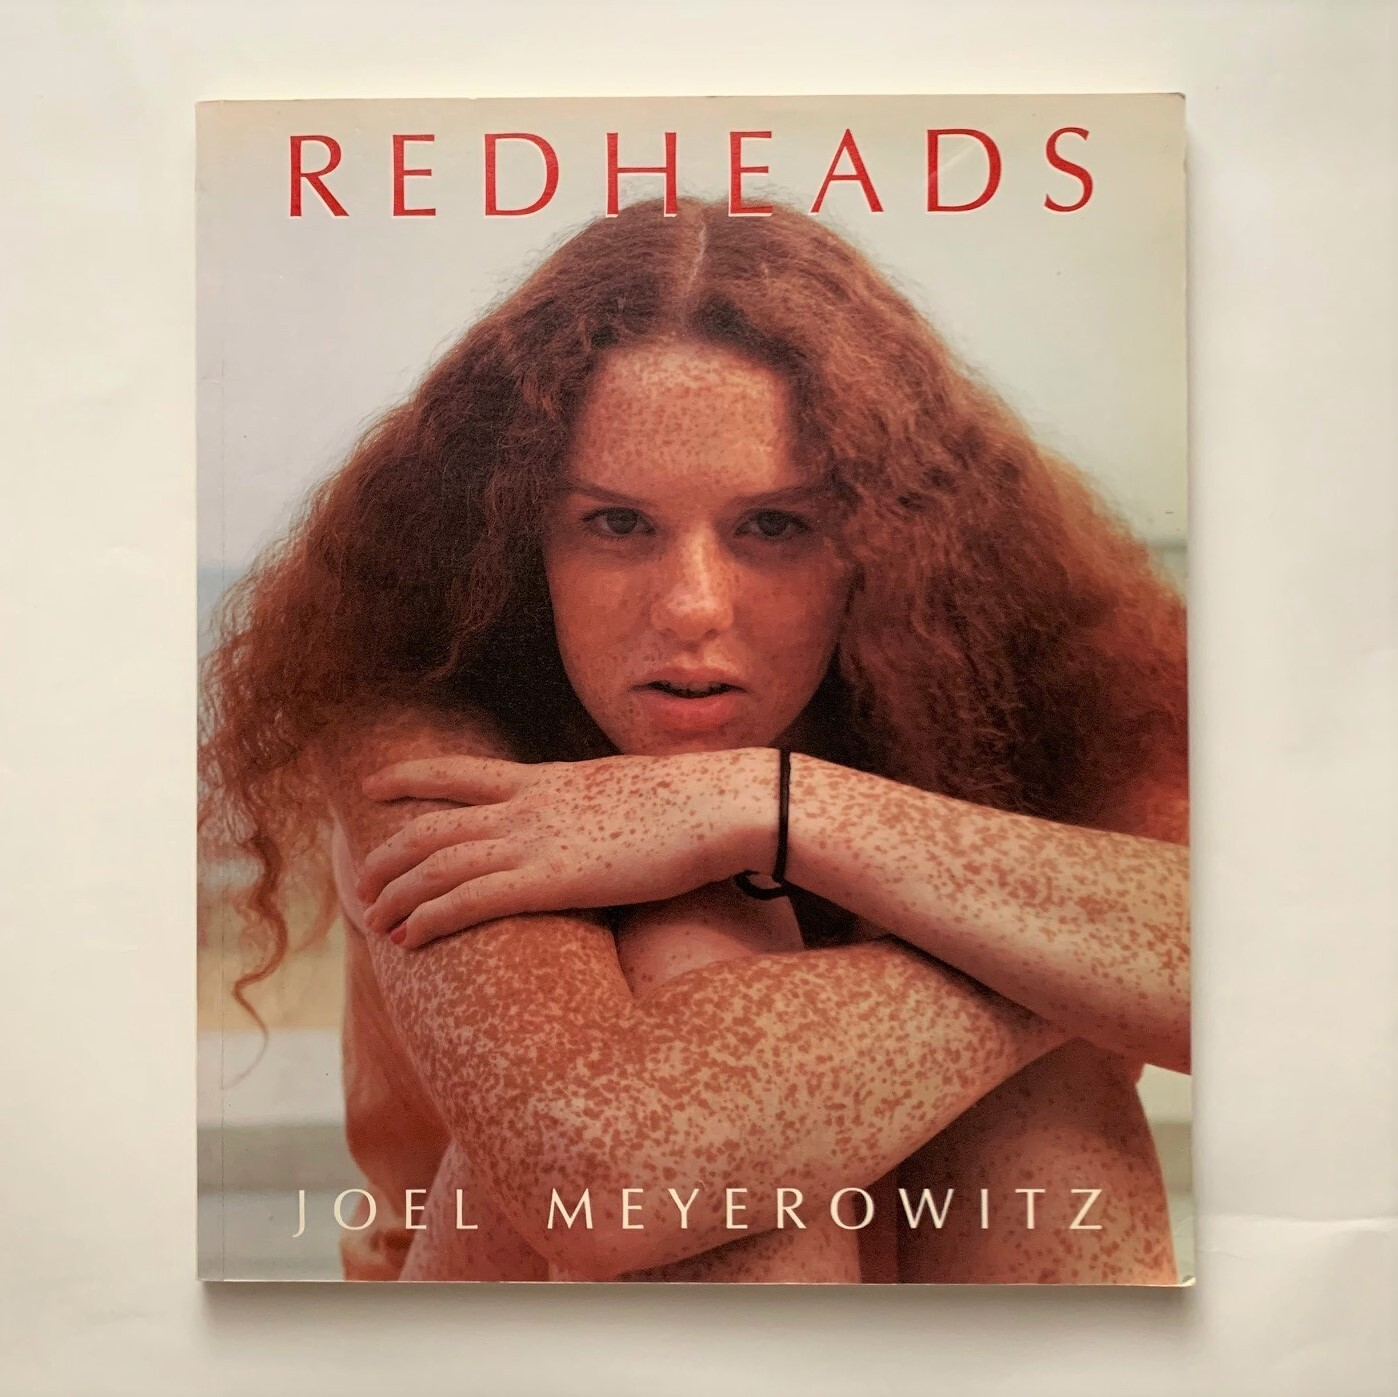 Redheads / Joel Meyerowitz ジョエル・マイヤロウィッツ